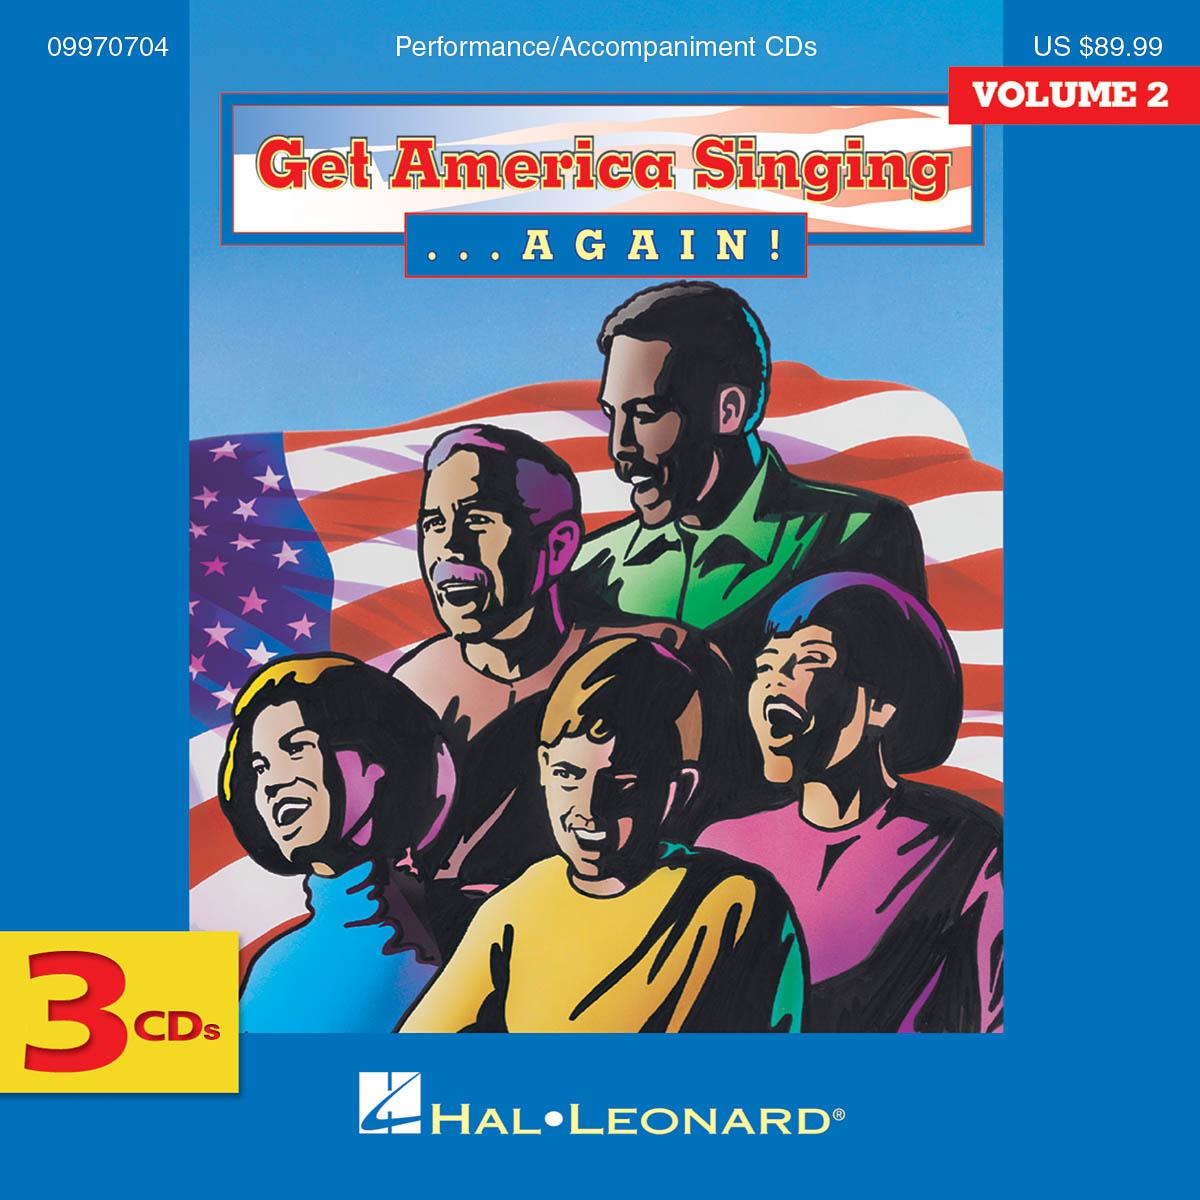 Get America Singing Again Vol 2 Complete 3-CD Set: Mixed Choir: CD